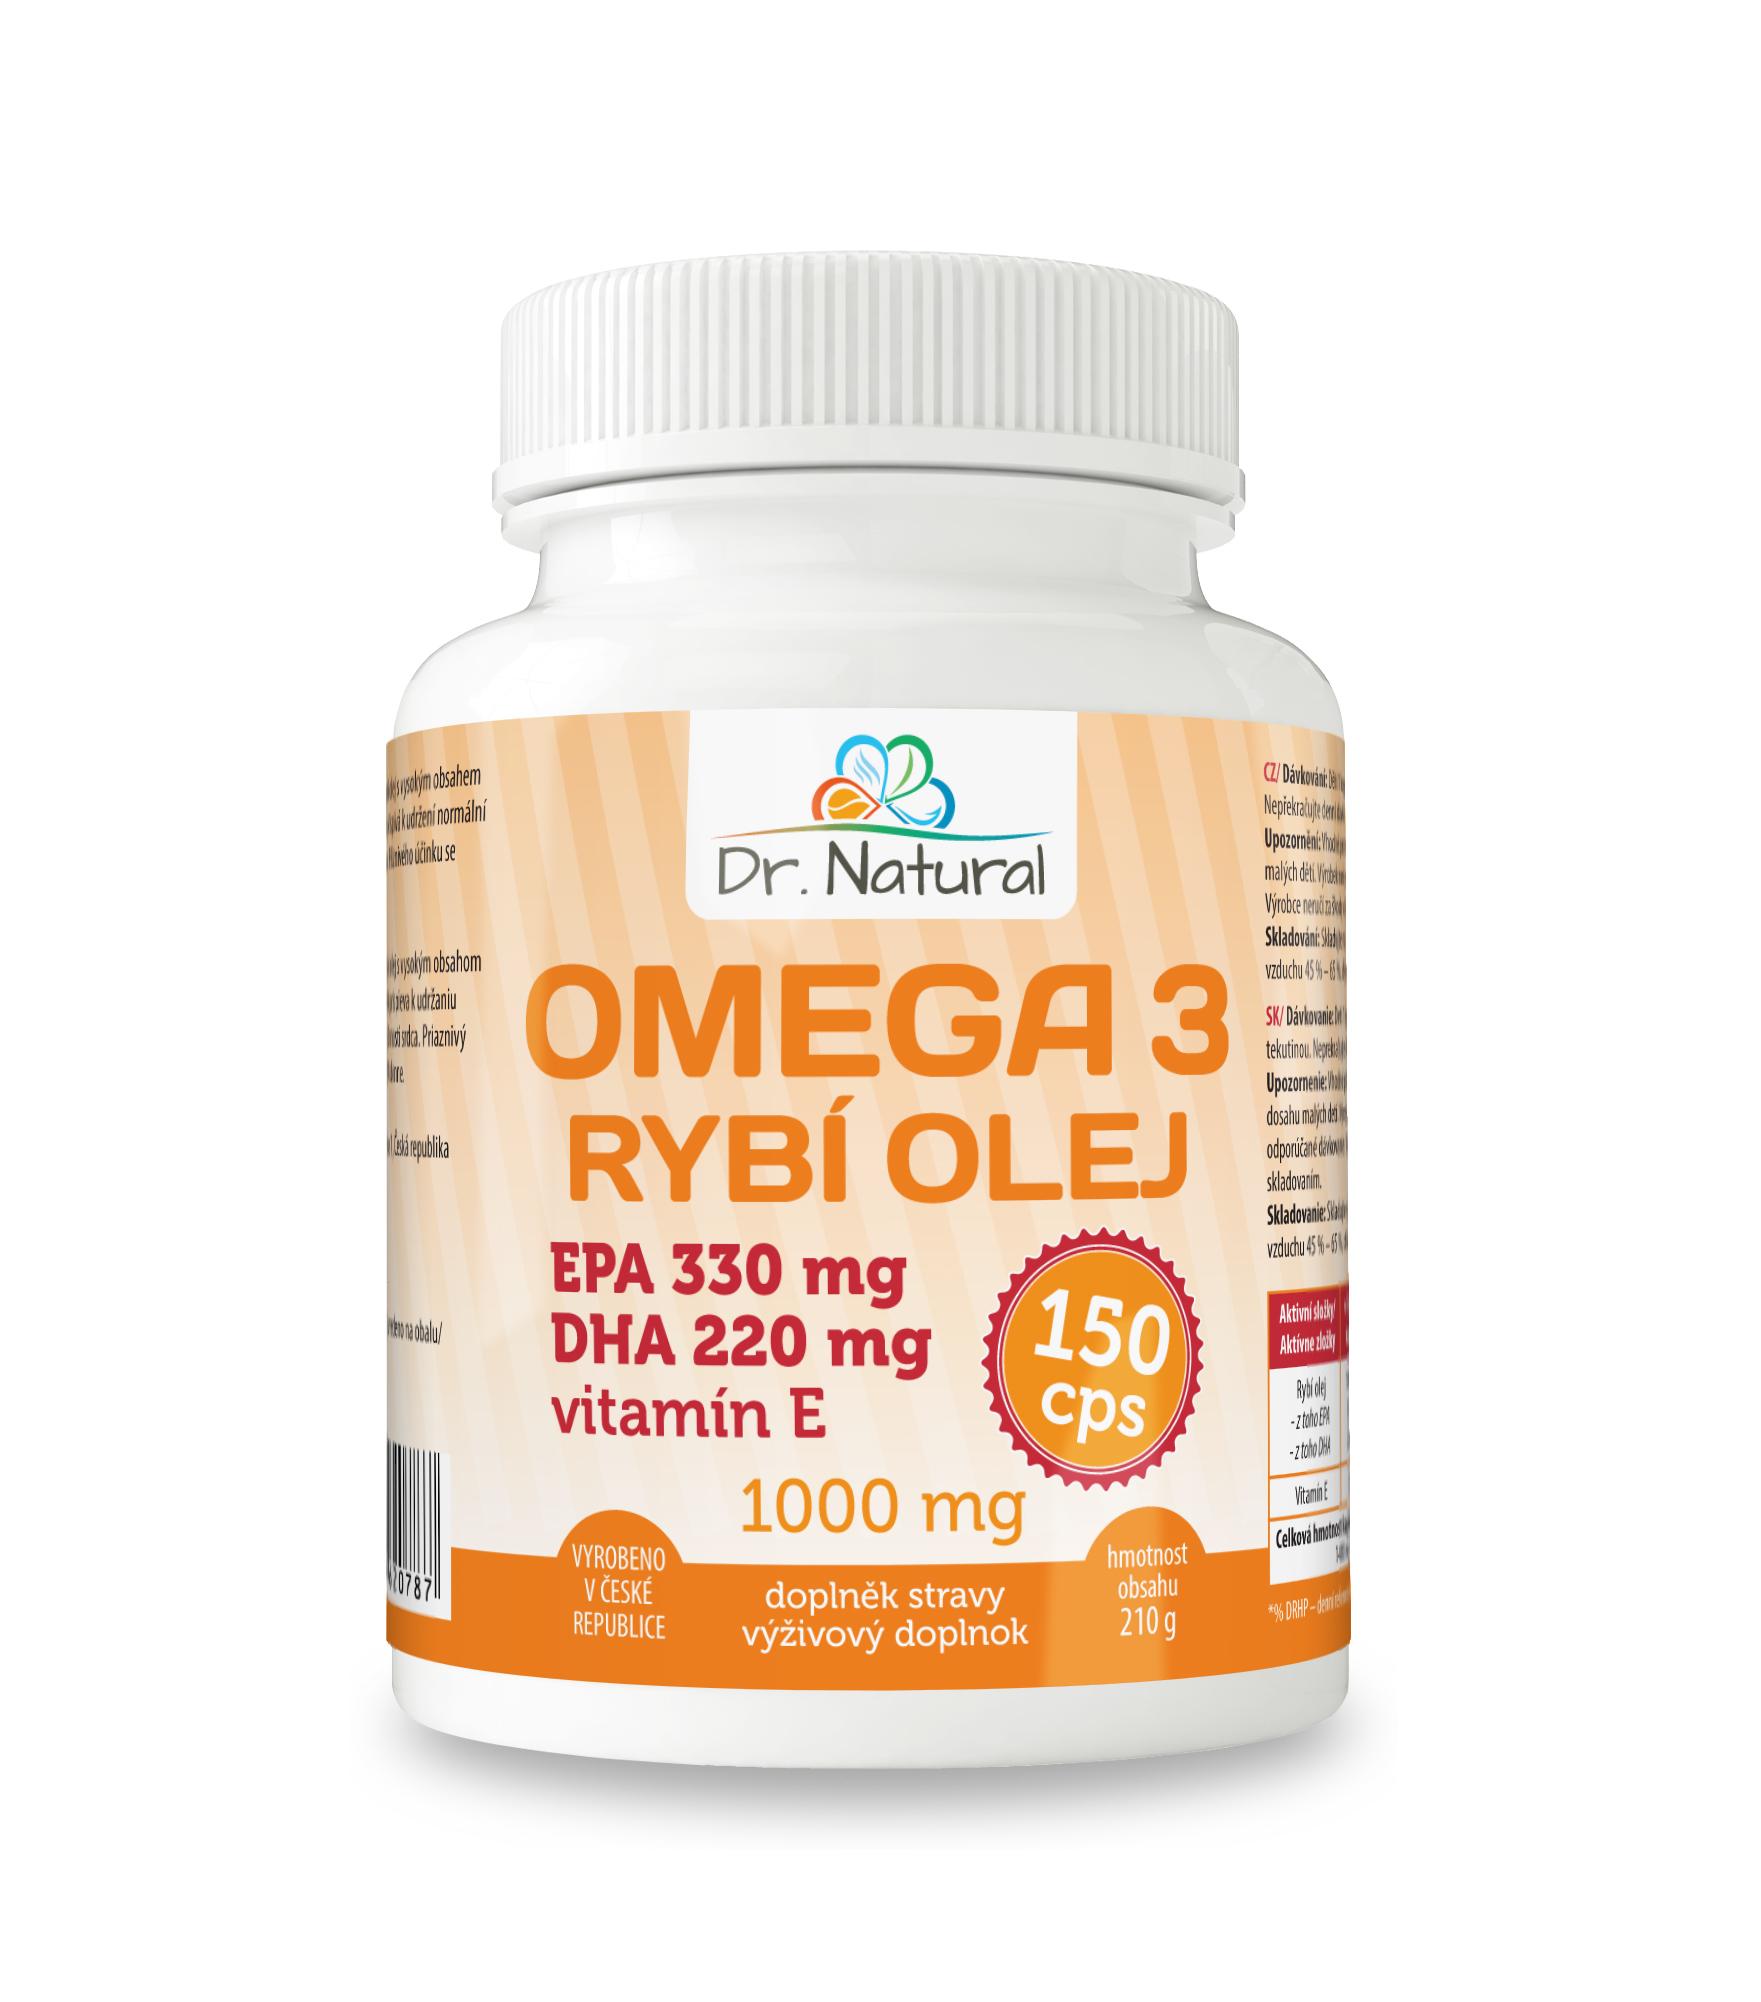 Omega 3 Rybí olej 1000mg EPA330mg/DHA220mg 150 cps.